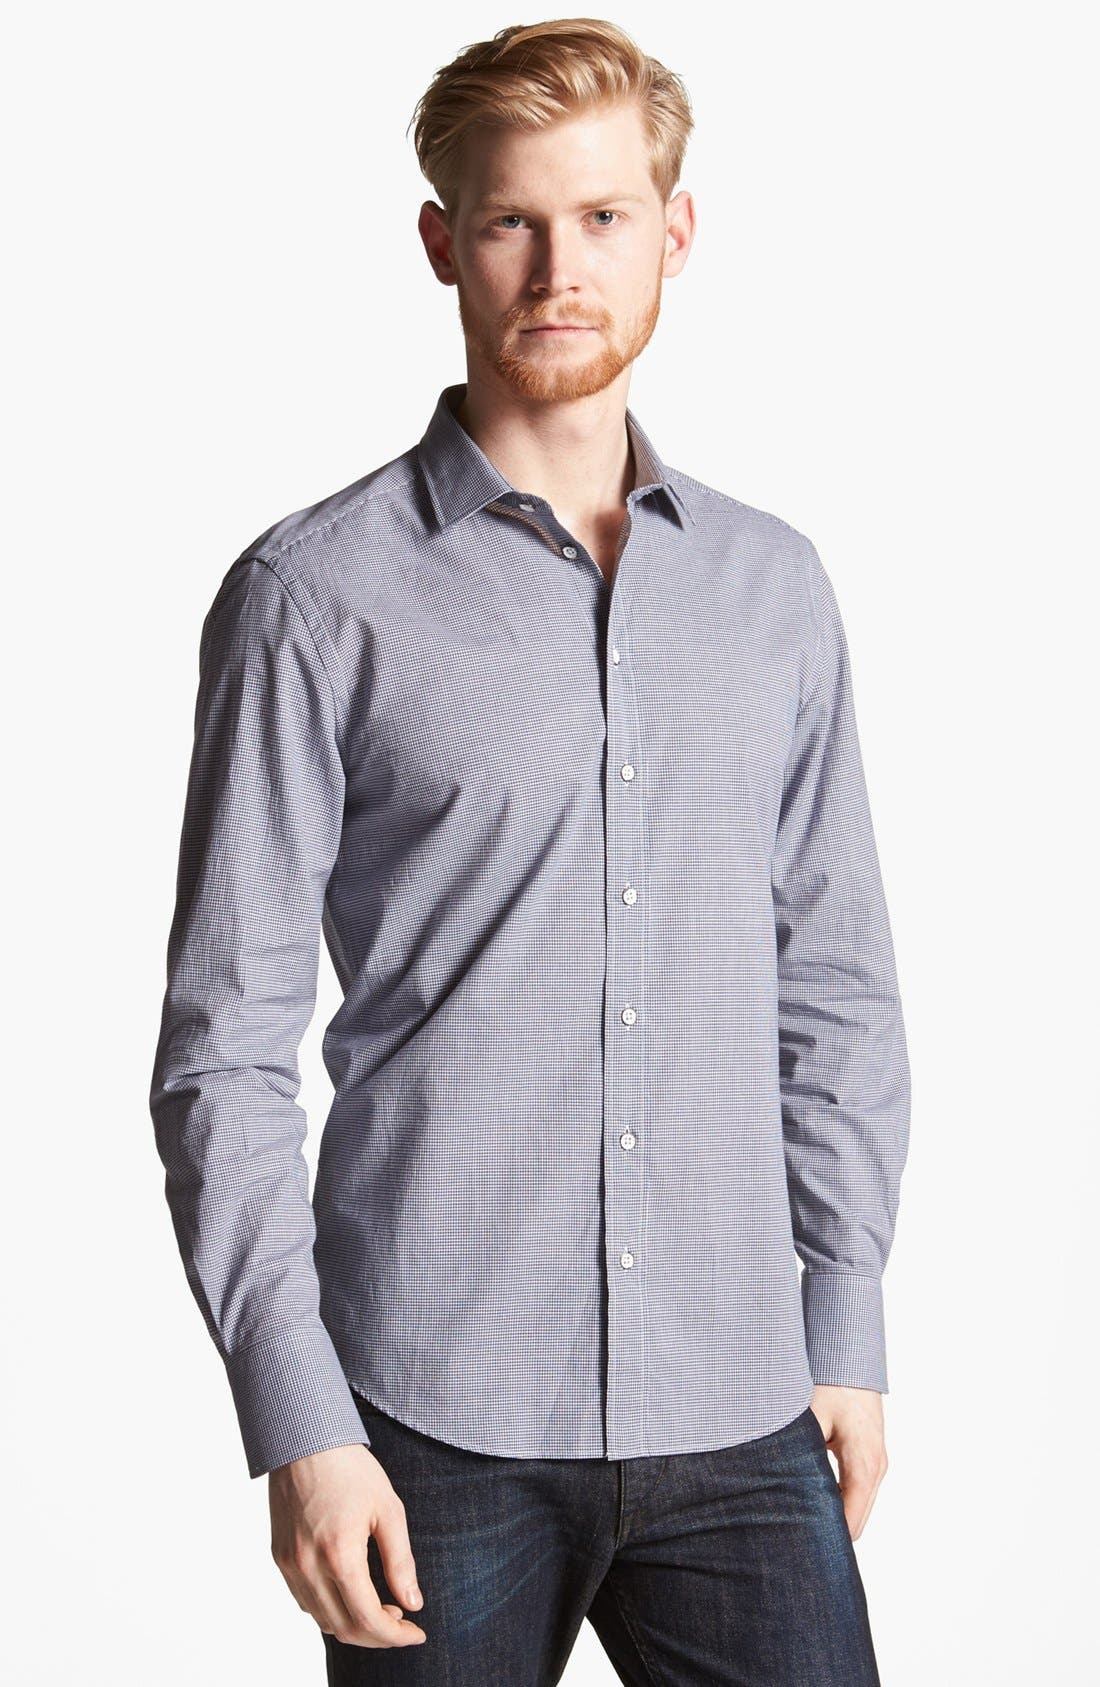 Main Image - rag & bone 'Charles' Micro Gingham Woven Shirt